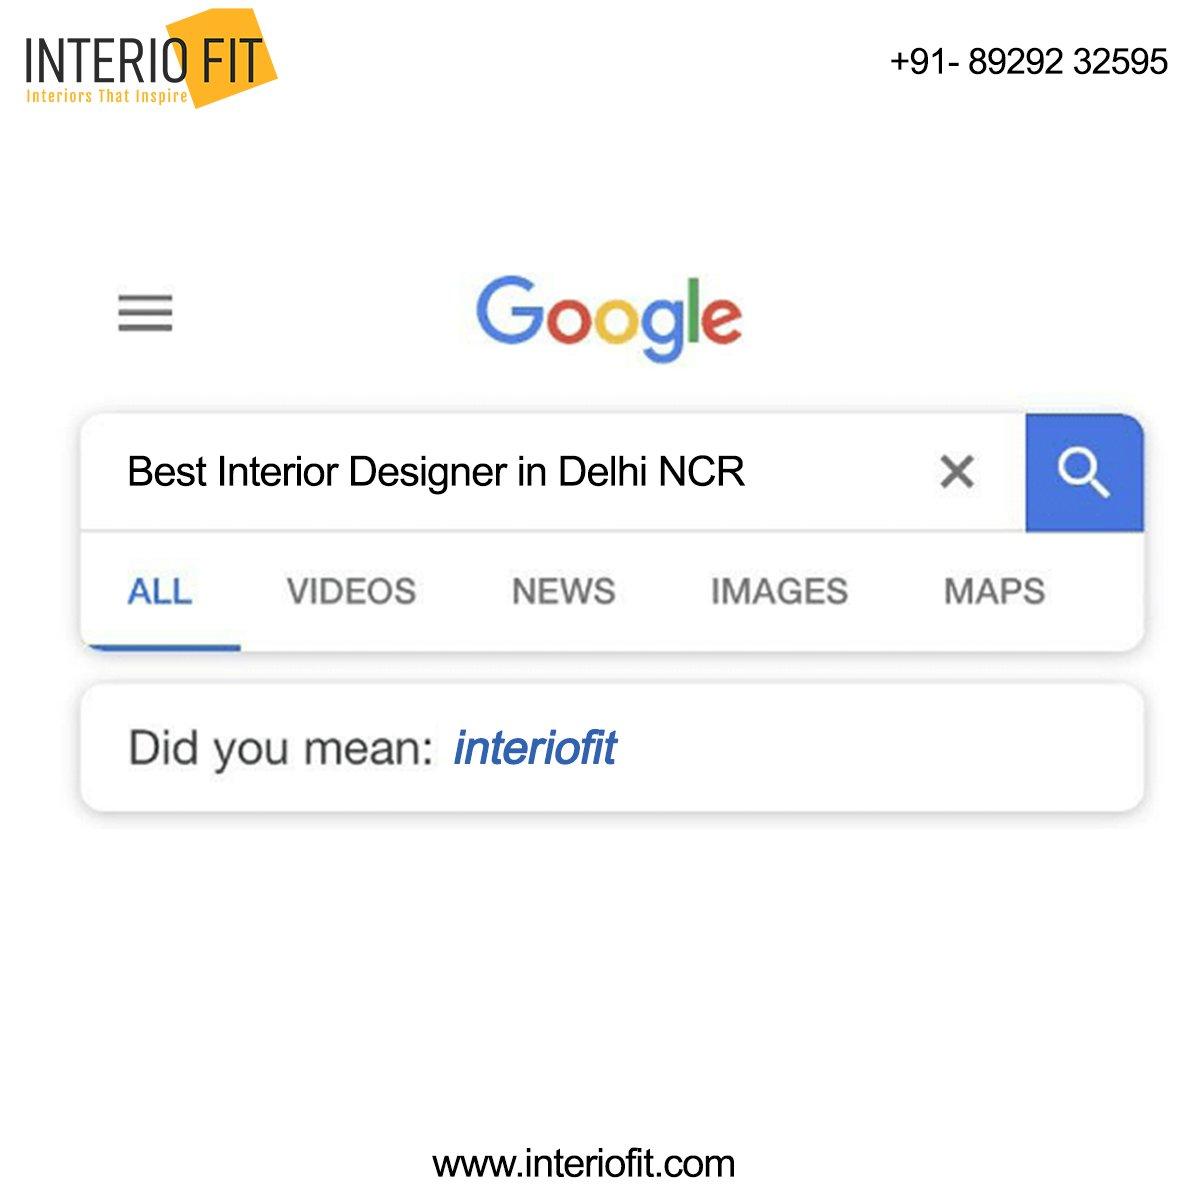 Kabhi kabhi lagta hai Google ich hi bhagwan hai! #didyoumean #google #googleknowseverything #googleknows #bestinterior #interiofit #delhincr #interiors #interiordesigner #interiors #home #office #corporate #homedecor #commercial #noida #gurgaonpic.twitter.com/FJ2foCWrkD